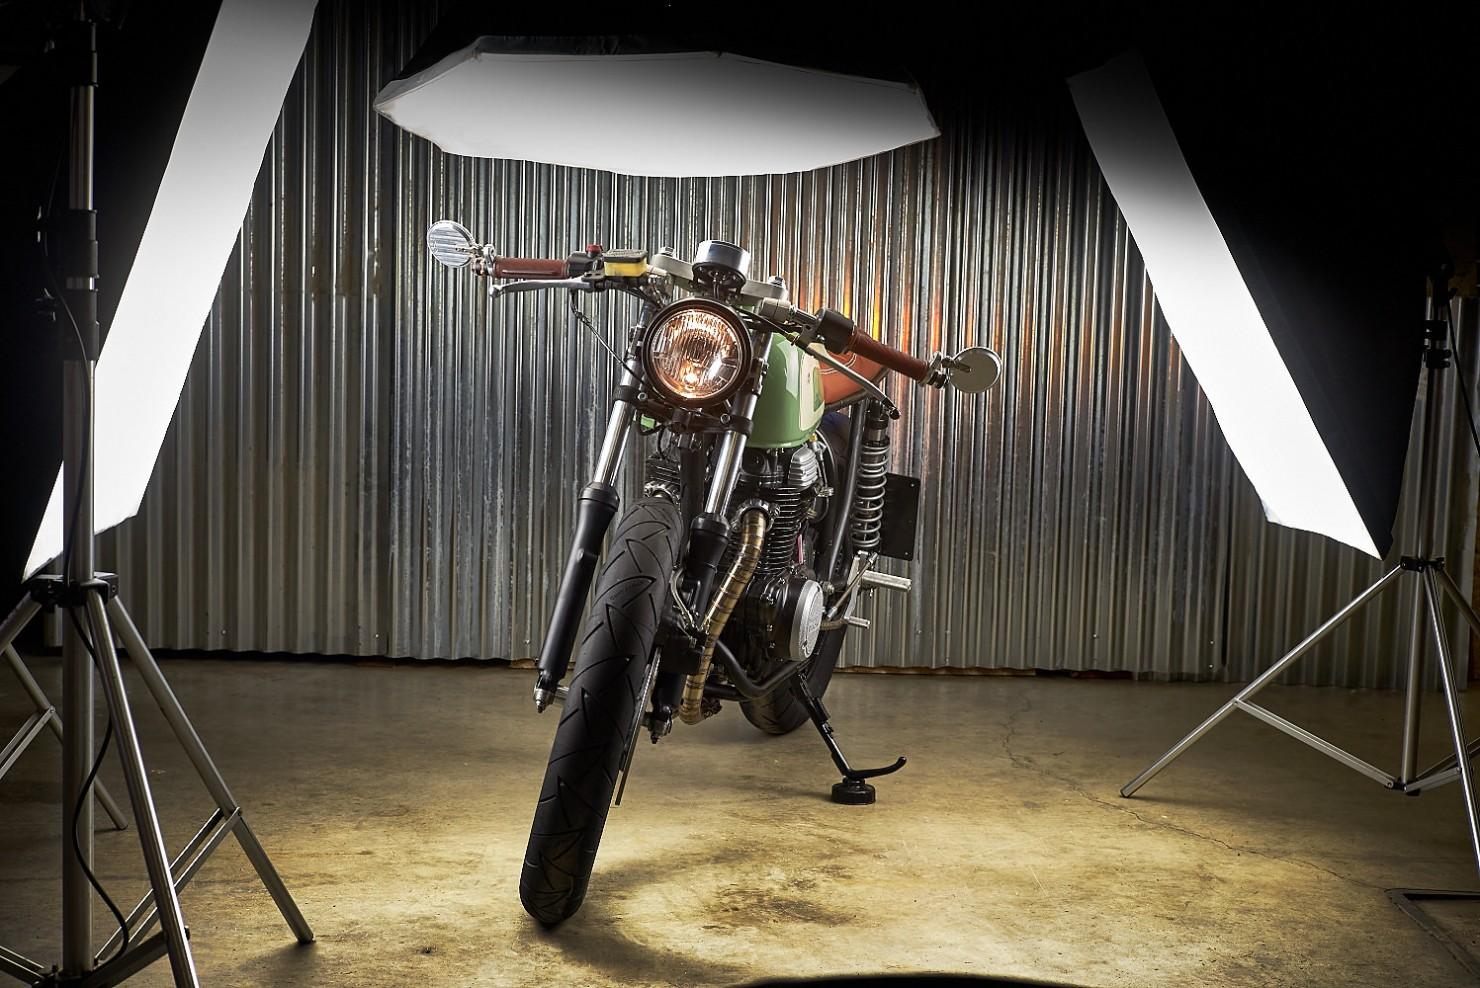 Honda-CB360-Motorcycle-4